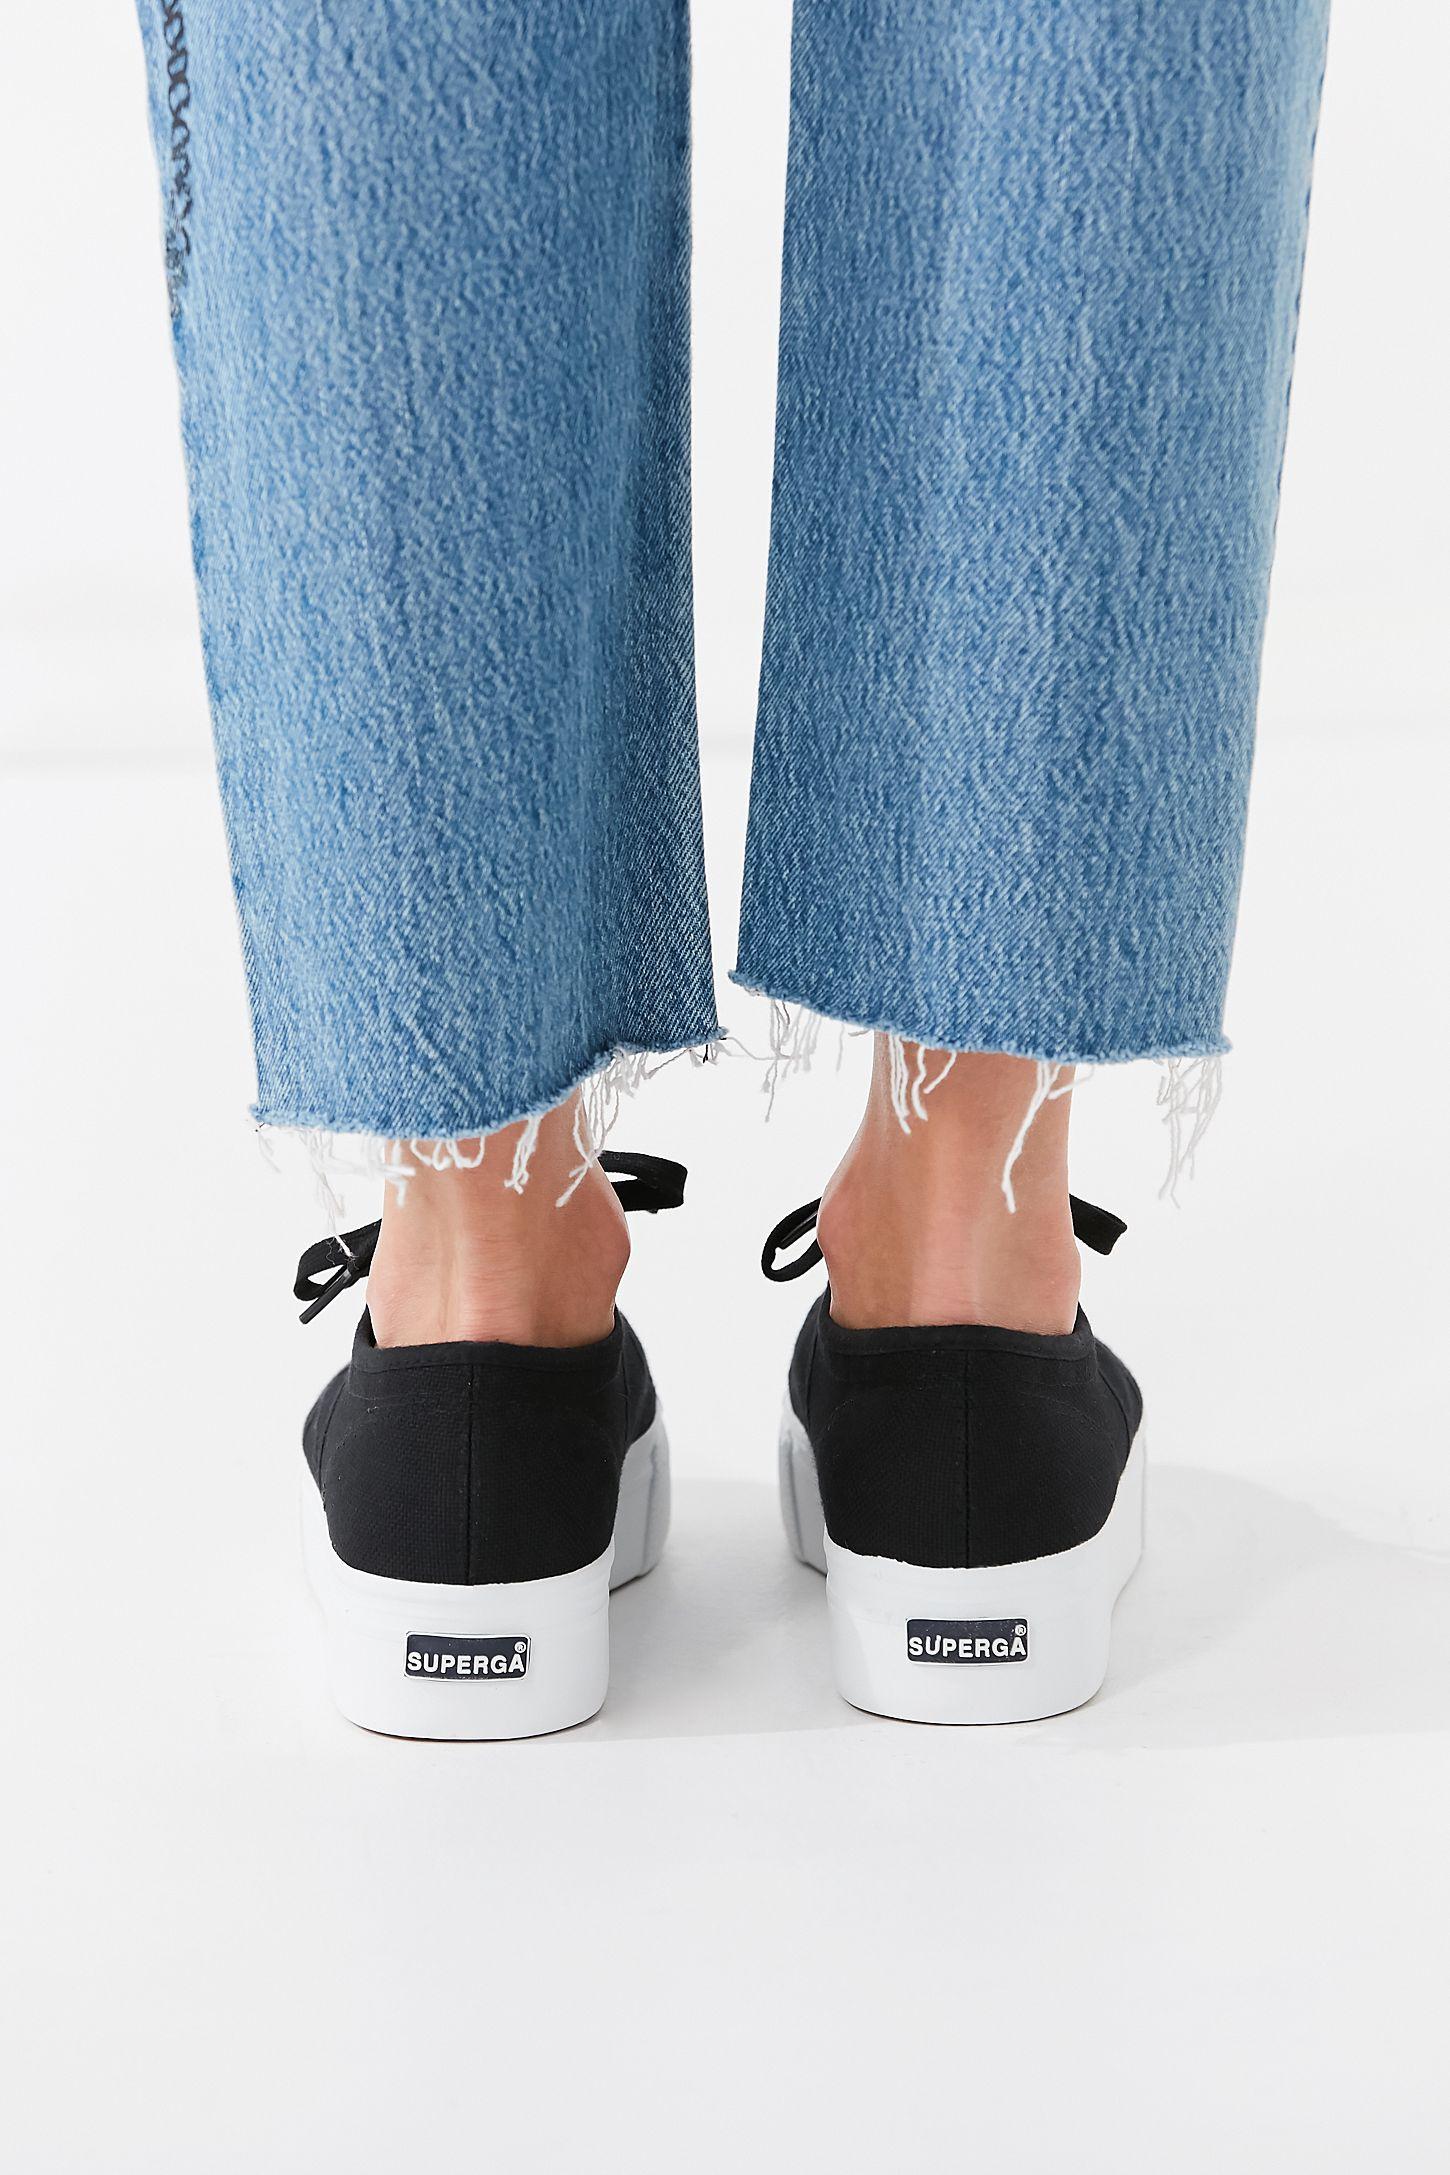 95d57fedcff1 Slide View  6  Superga 2790 Linea Platform Sneaker